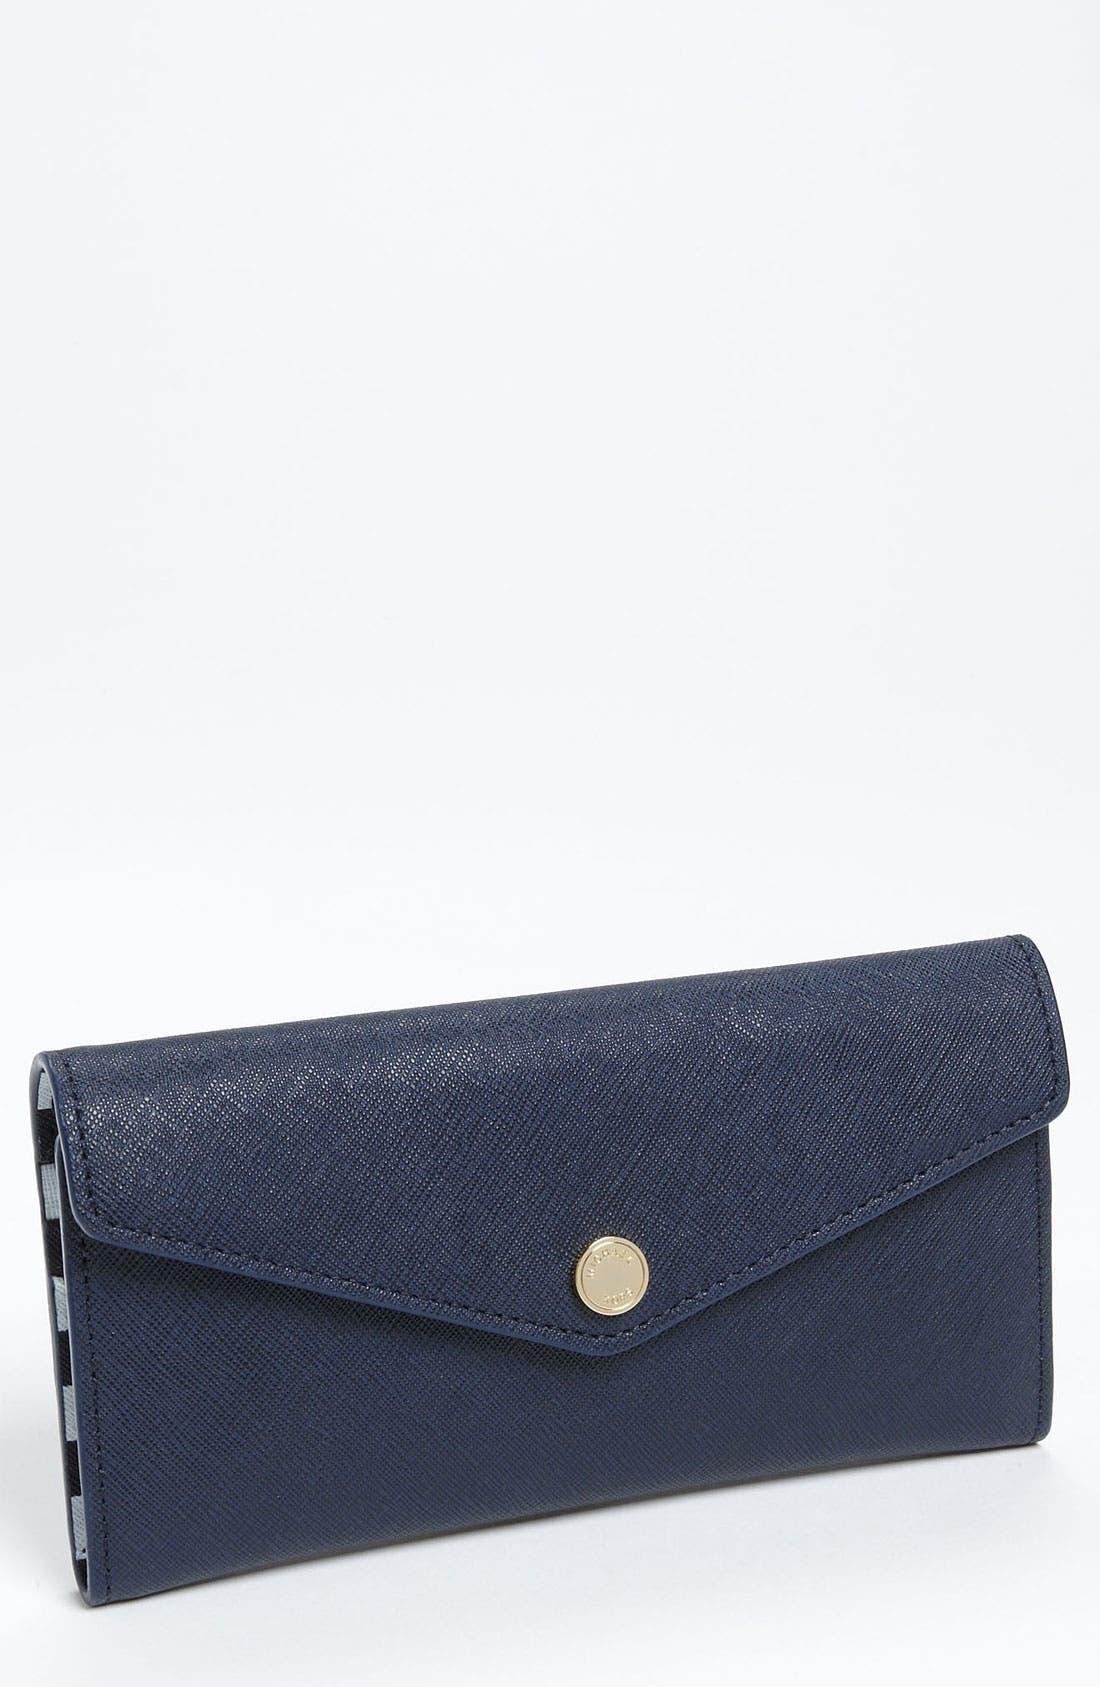 Main Image - MICHAEL Michael Kors Saffiano Carryall Wallet